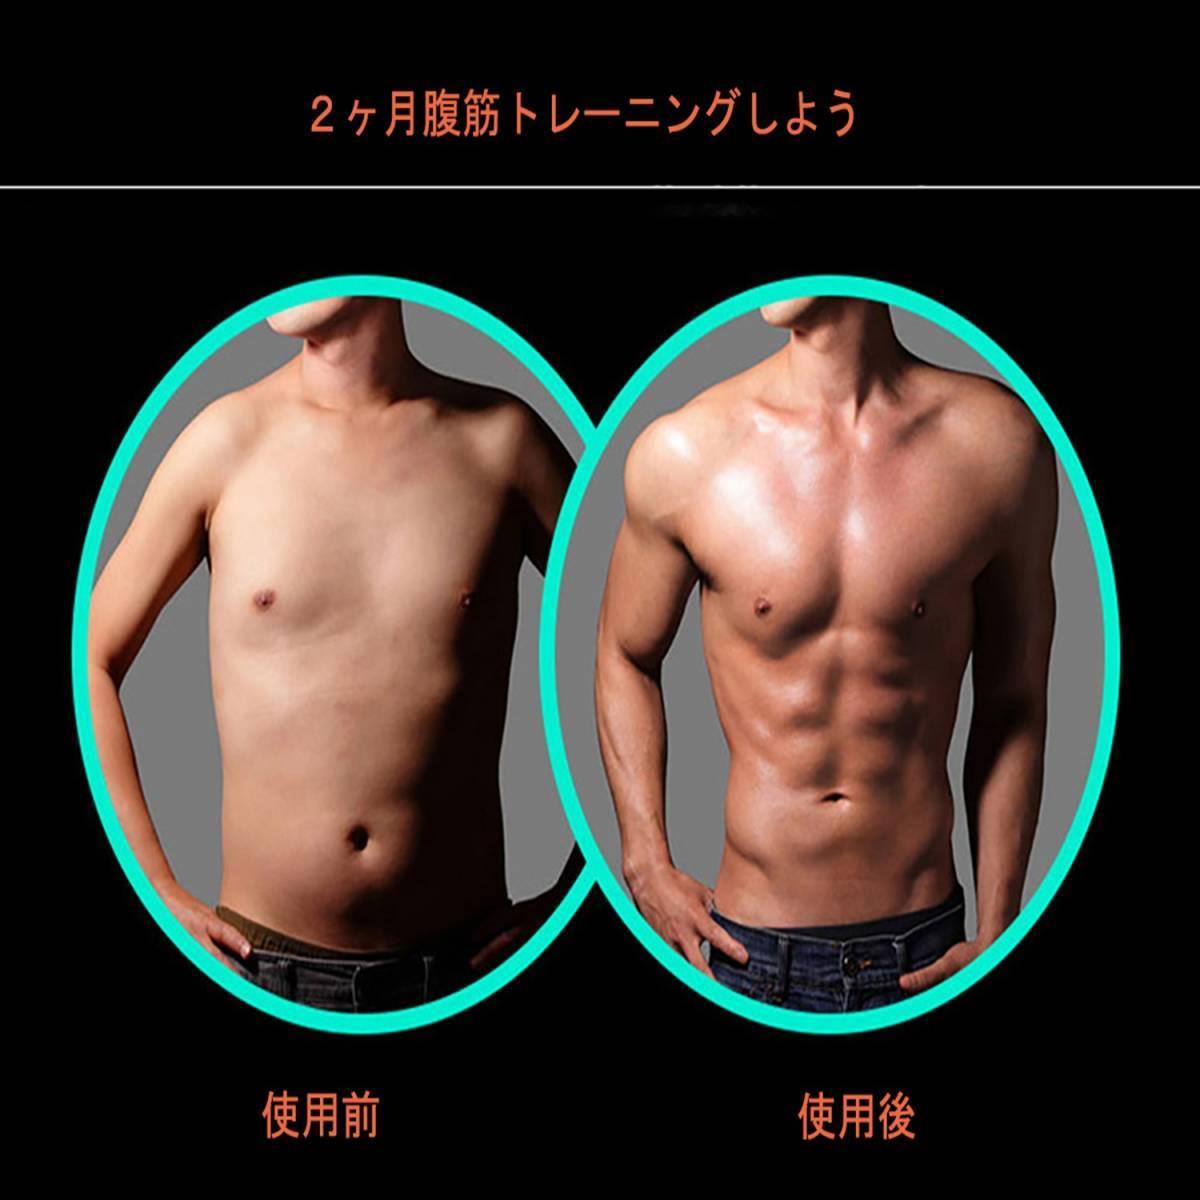 EMS 腹筋ベルト 腹筋マシーン 腹筋パッド 太もも 腕筋 筋トレ器具 ダイエット USB充電式 マッサージ エクササイズ 男女兼用_画像8